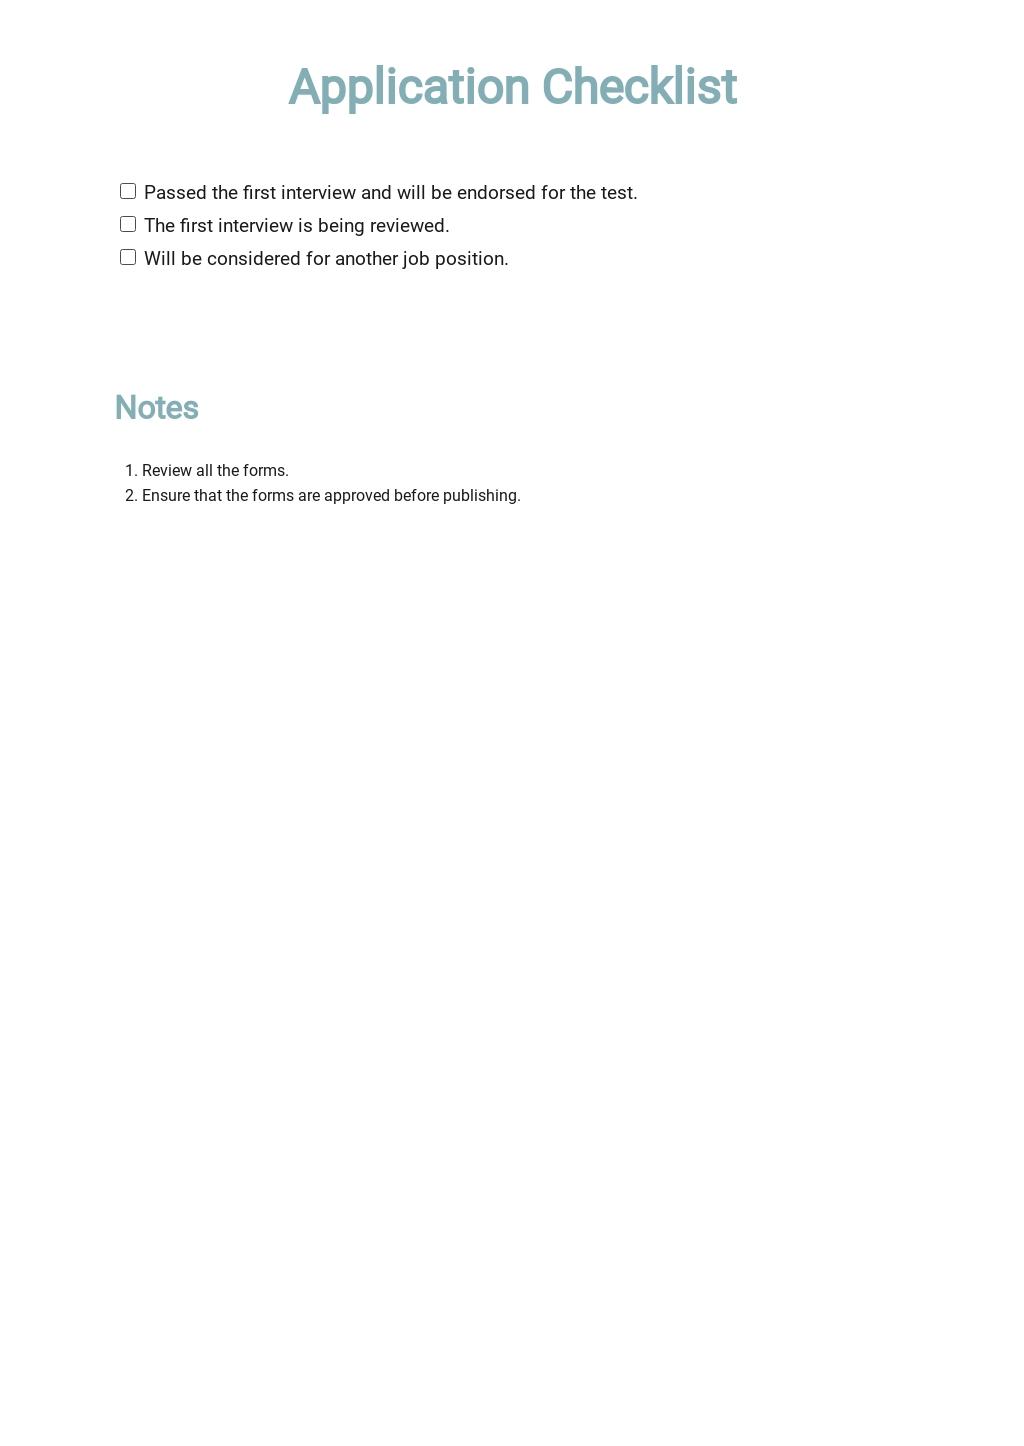 Application Checklist Template.jpe